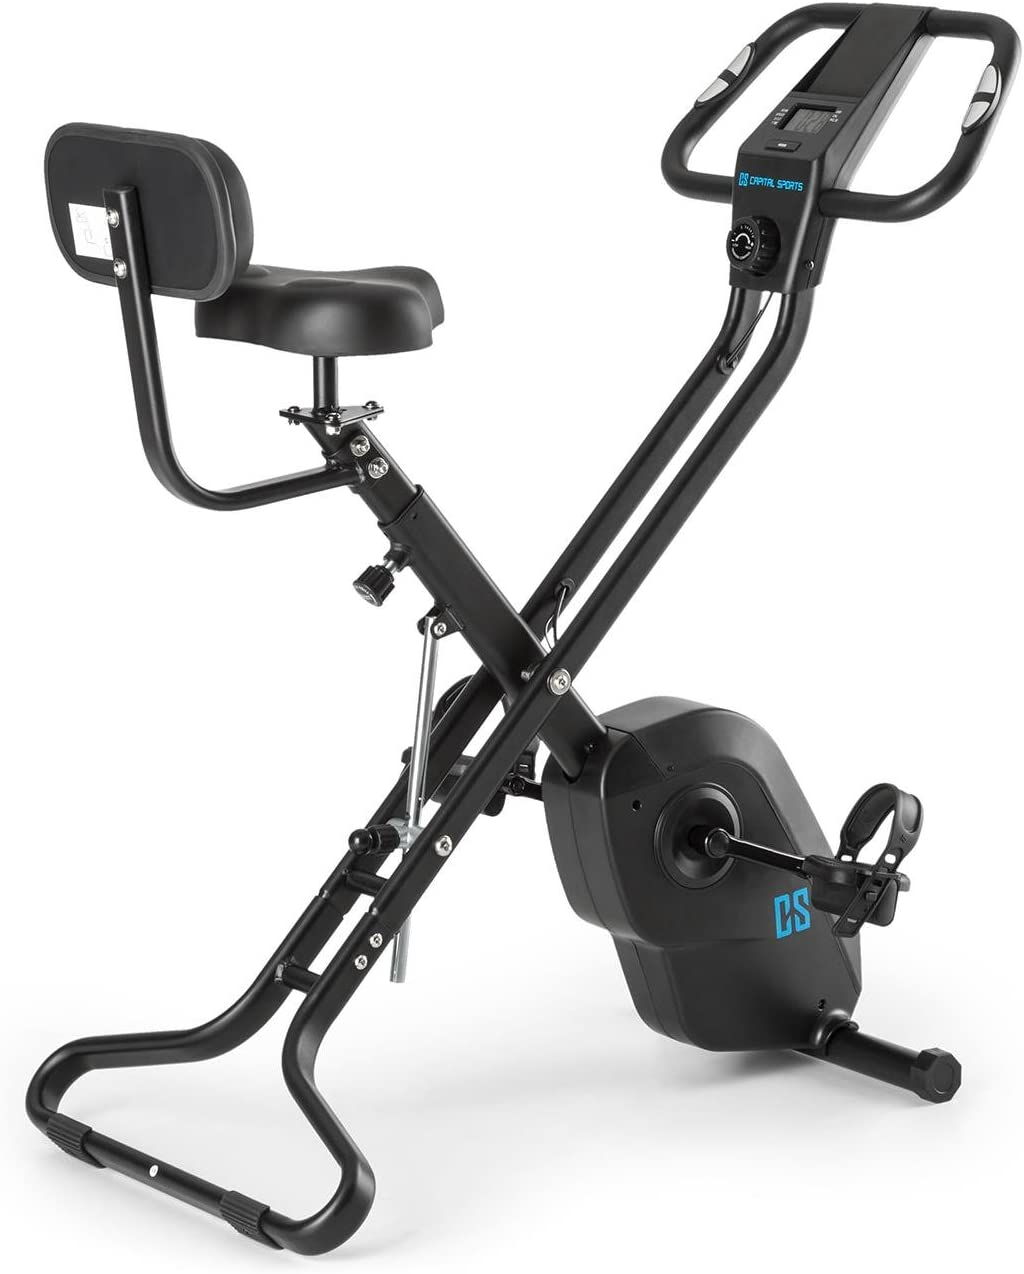 CAPITAL SPORTS Azura X2 - Bicicleta estática, Pulsómetro en manillar, Sistema plegable, Rotor de 4 kg, 7 niveles de altura, Peso máx. 120 kg, 8 niveles resistencia, Respaldo